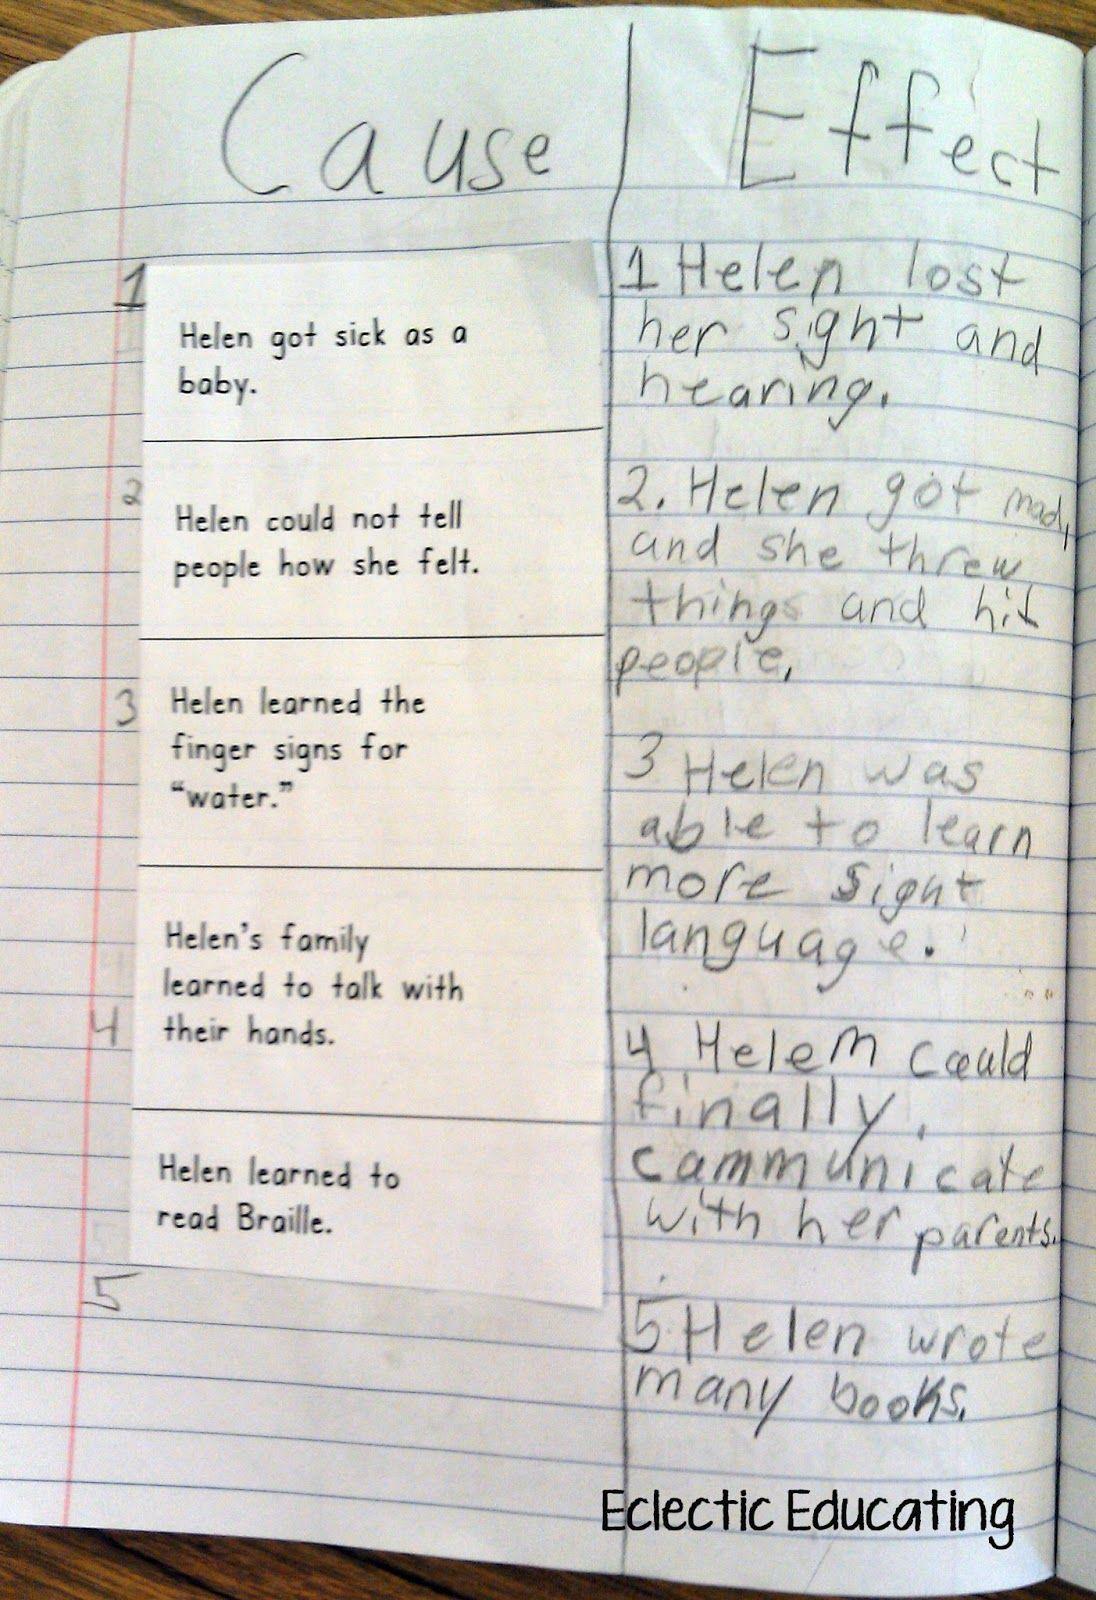 medium resolution of Eclectic Educating: Close Reading with Helen Keller   Helen keller  activities